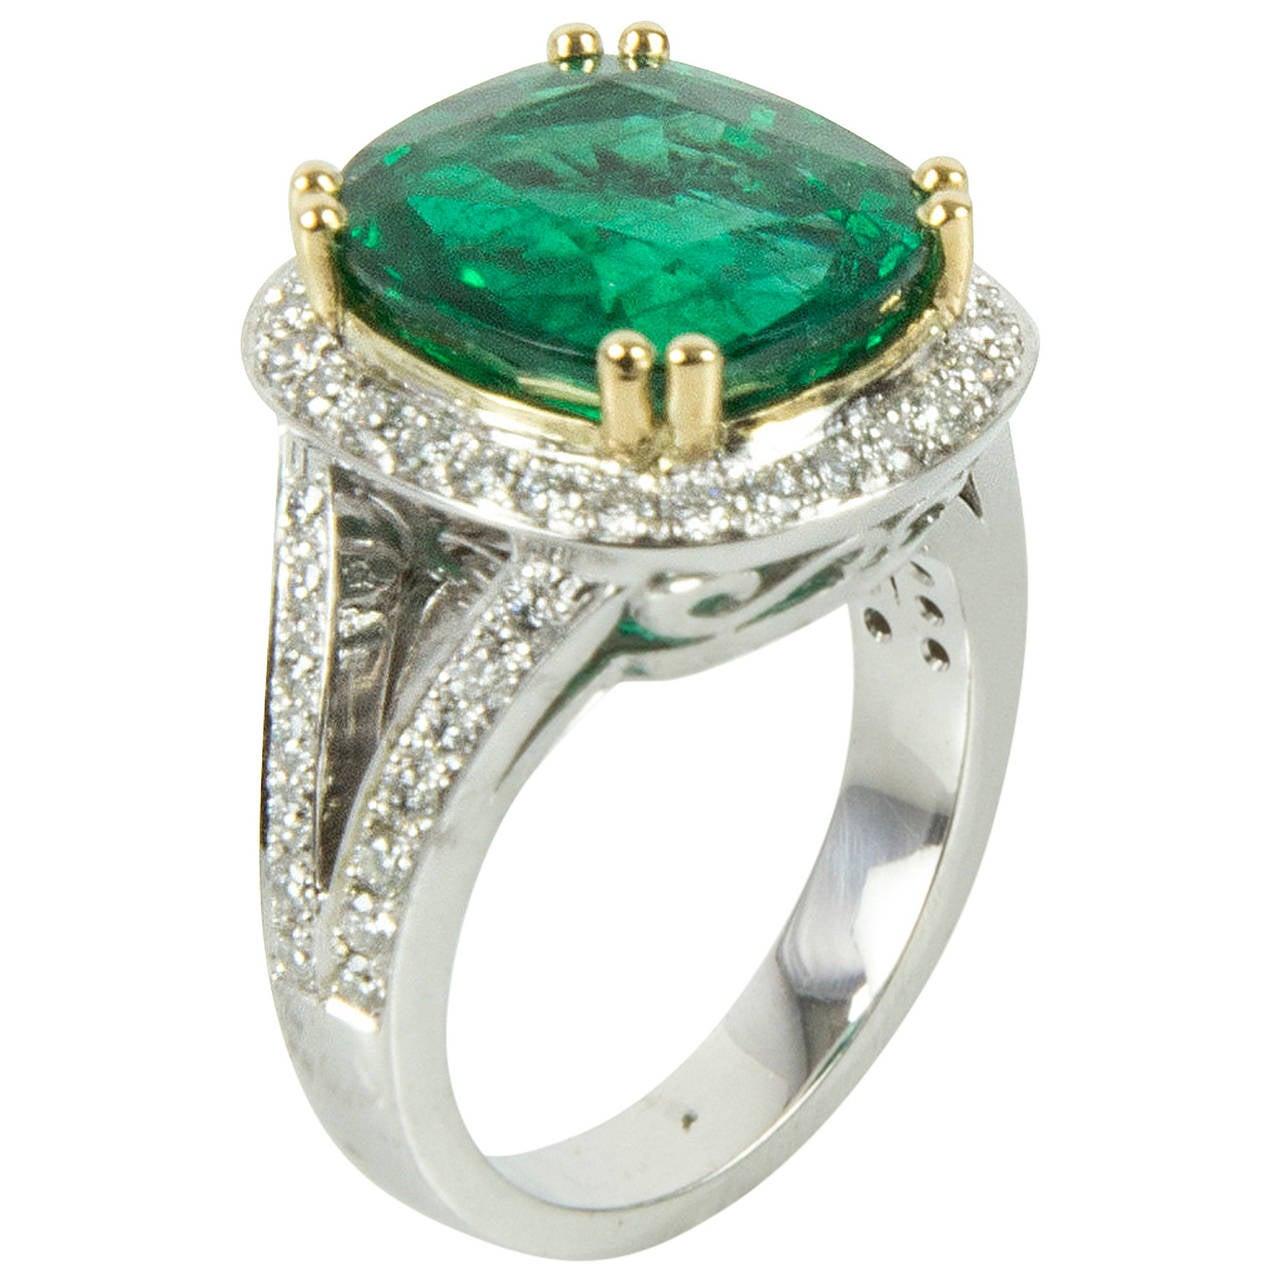 7.90 Carat Cushion Cut Emerald Diamond Gold Statement Ring